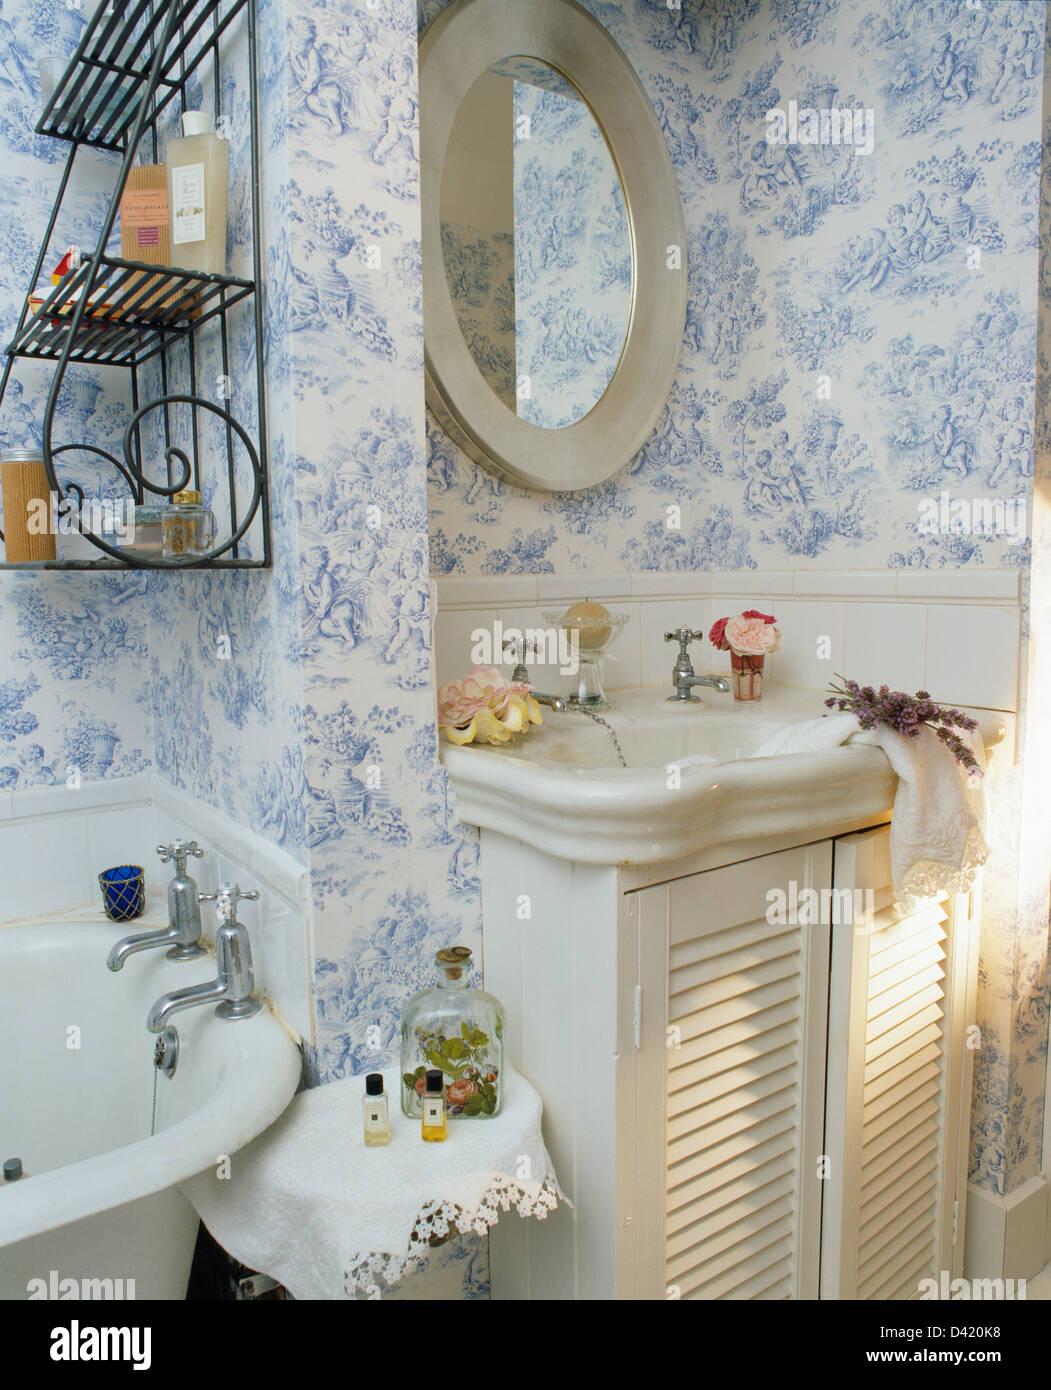 Vintage washbasin in vanity unit with louvred doors in for Vintage bathroom wallpaper